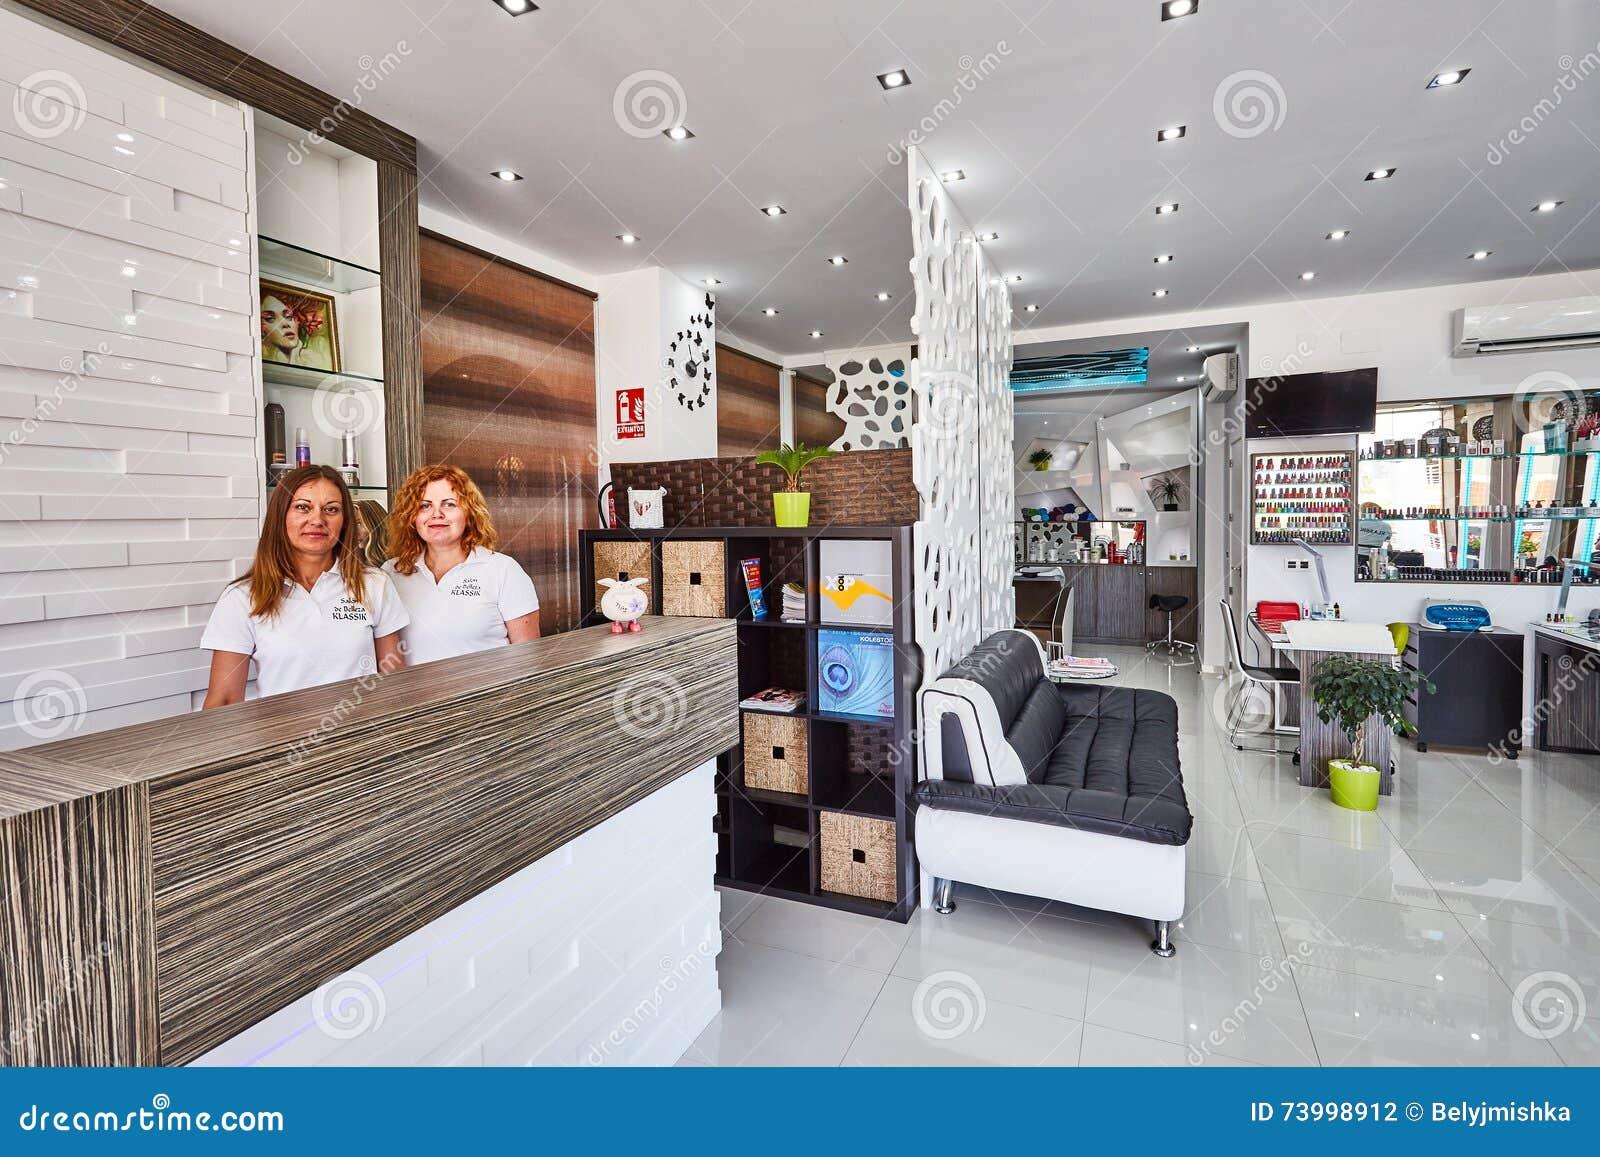 Orihuela, Spain- June 15, 2016: Beauty Salon With Modern Design In ...